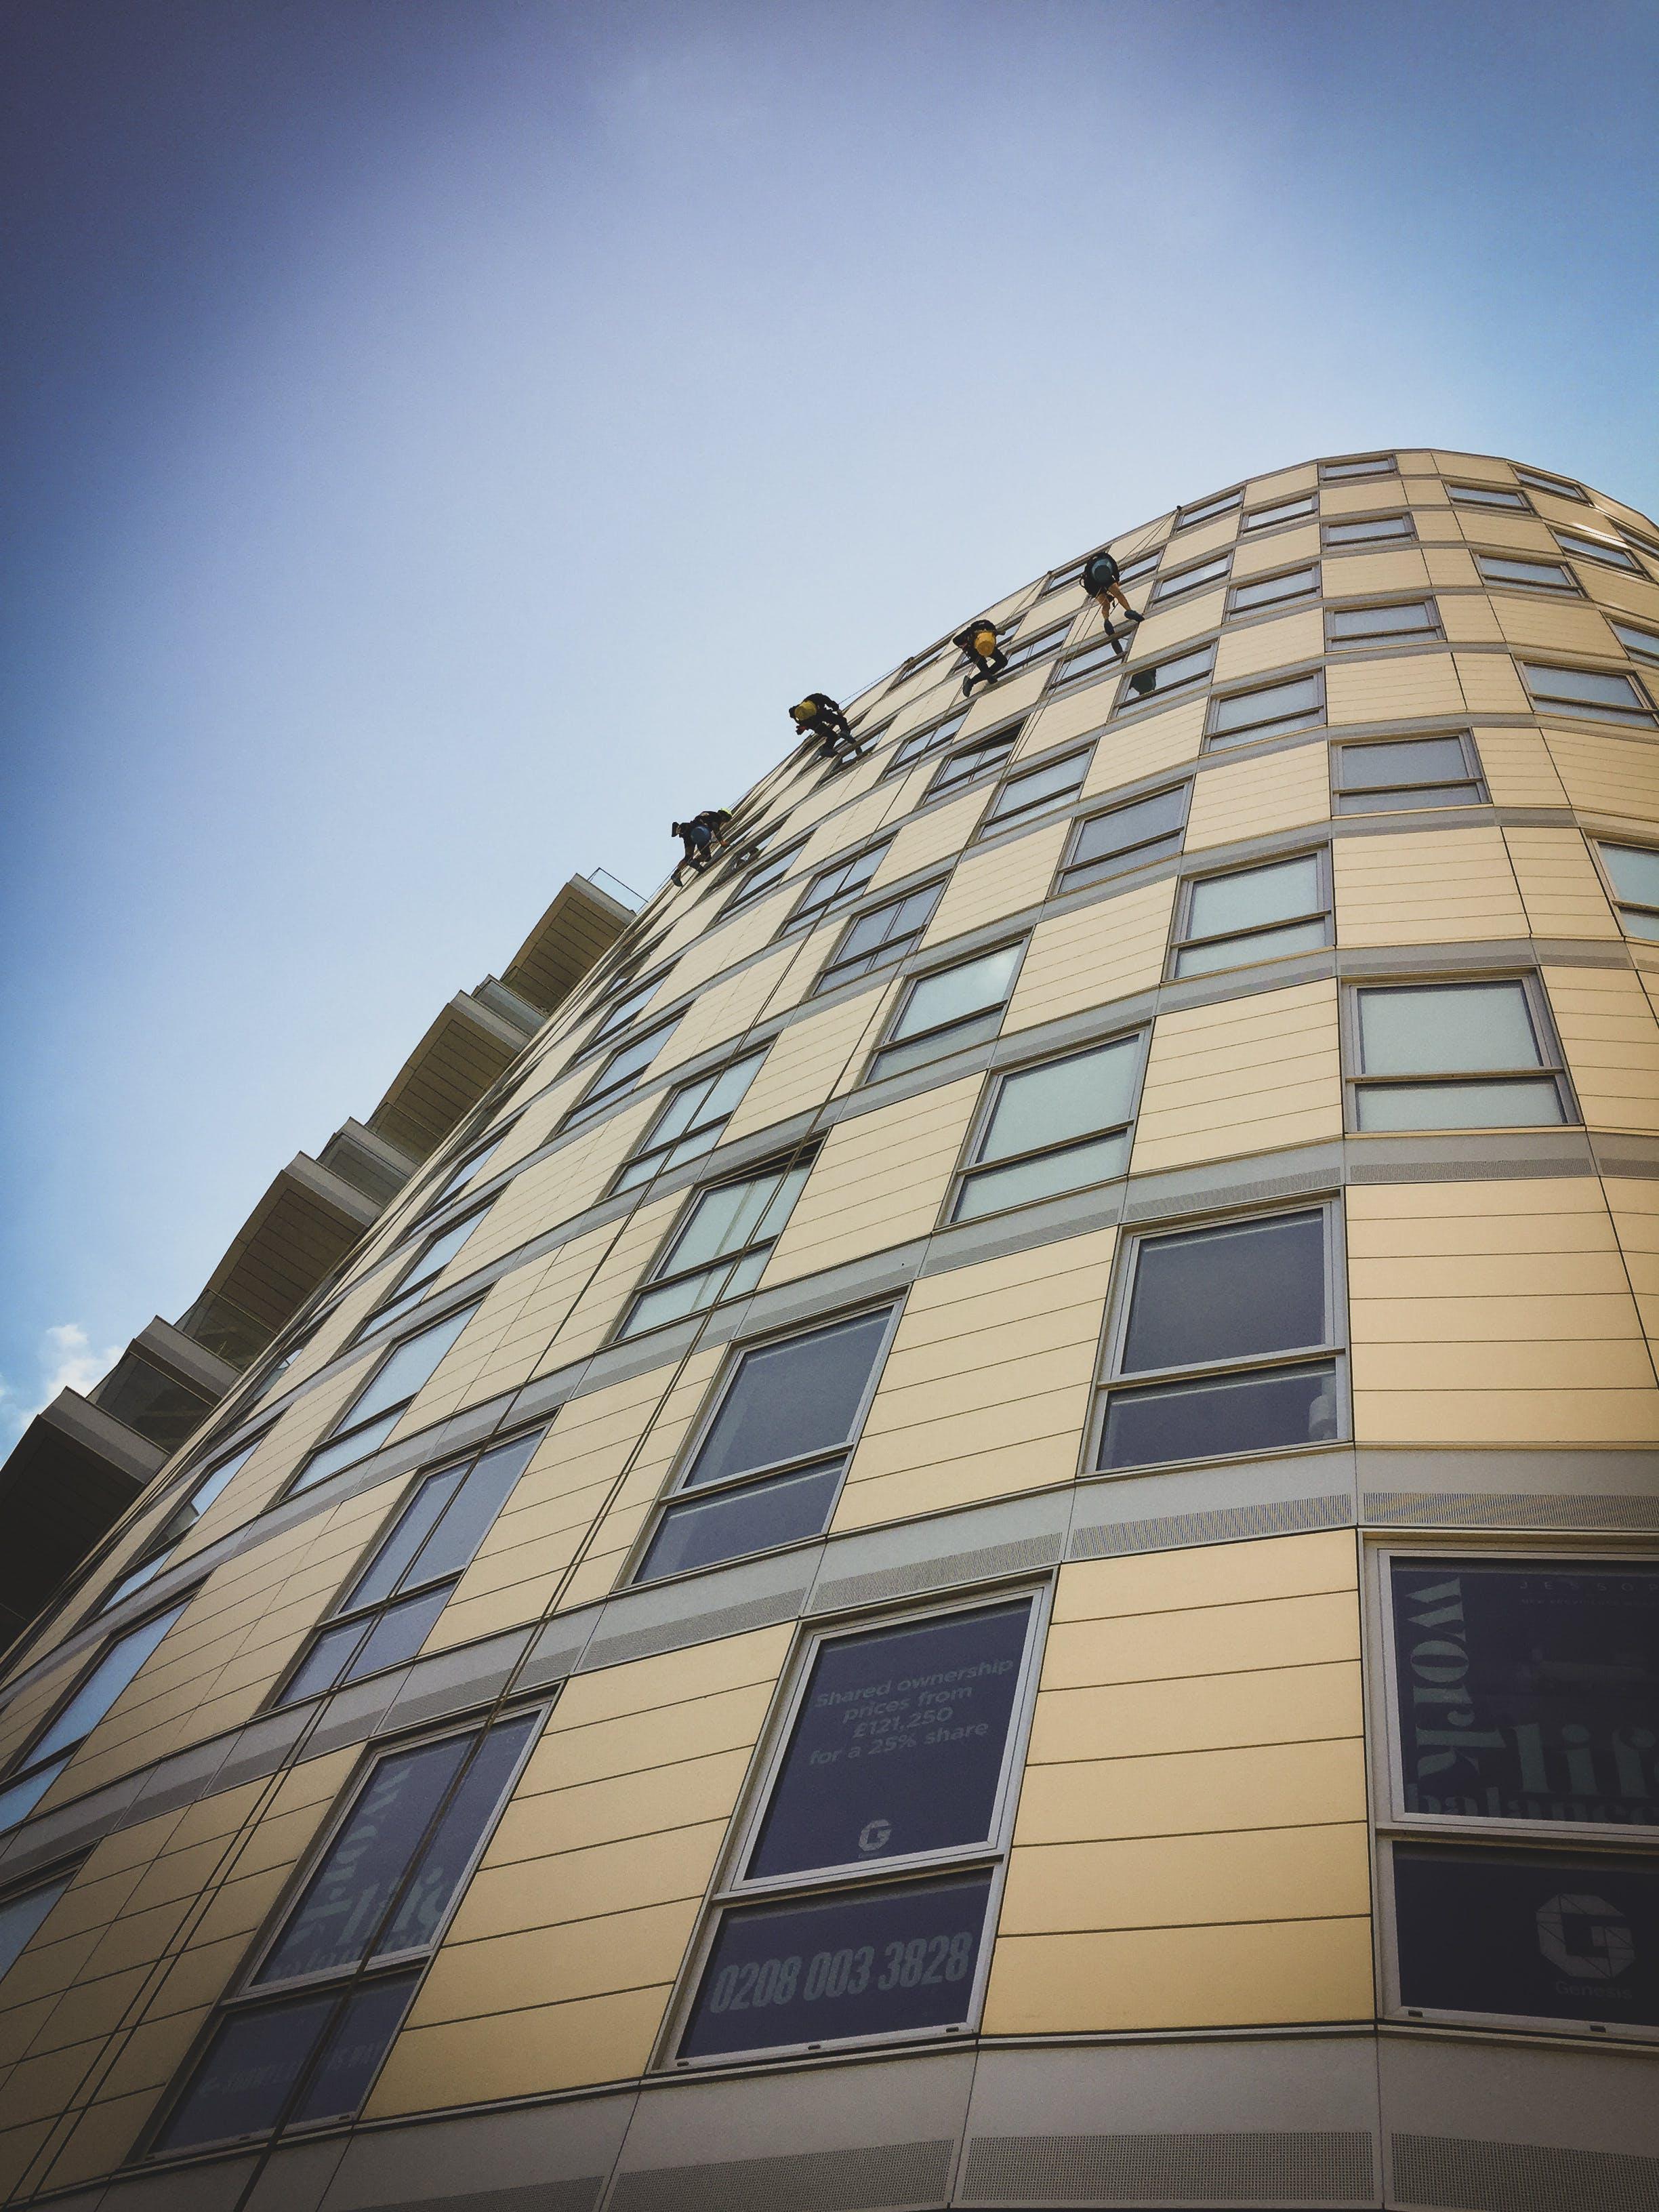 Beige High Rise Building Under Blue Sky